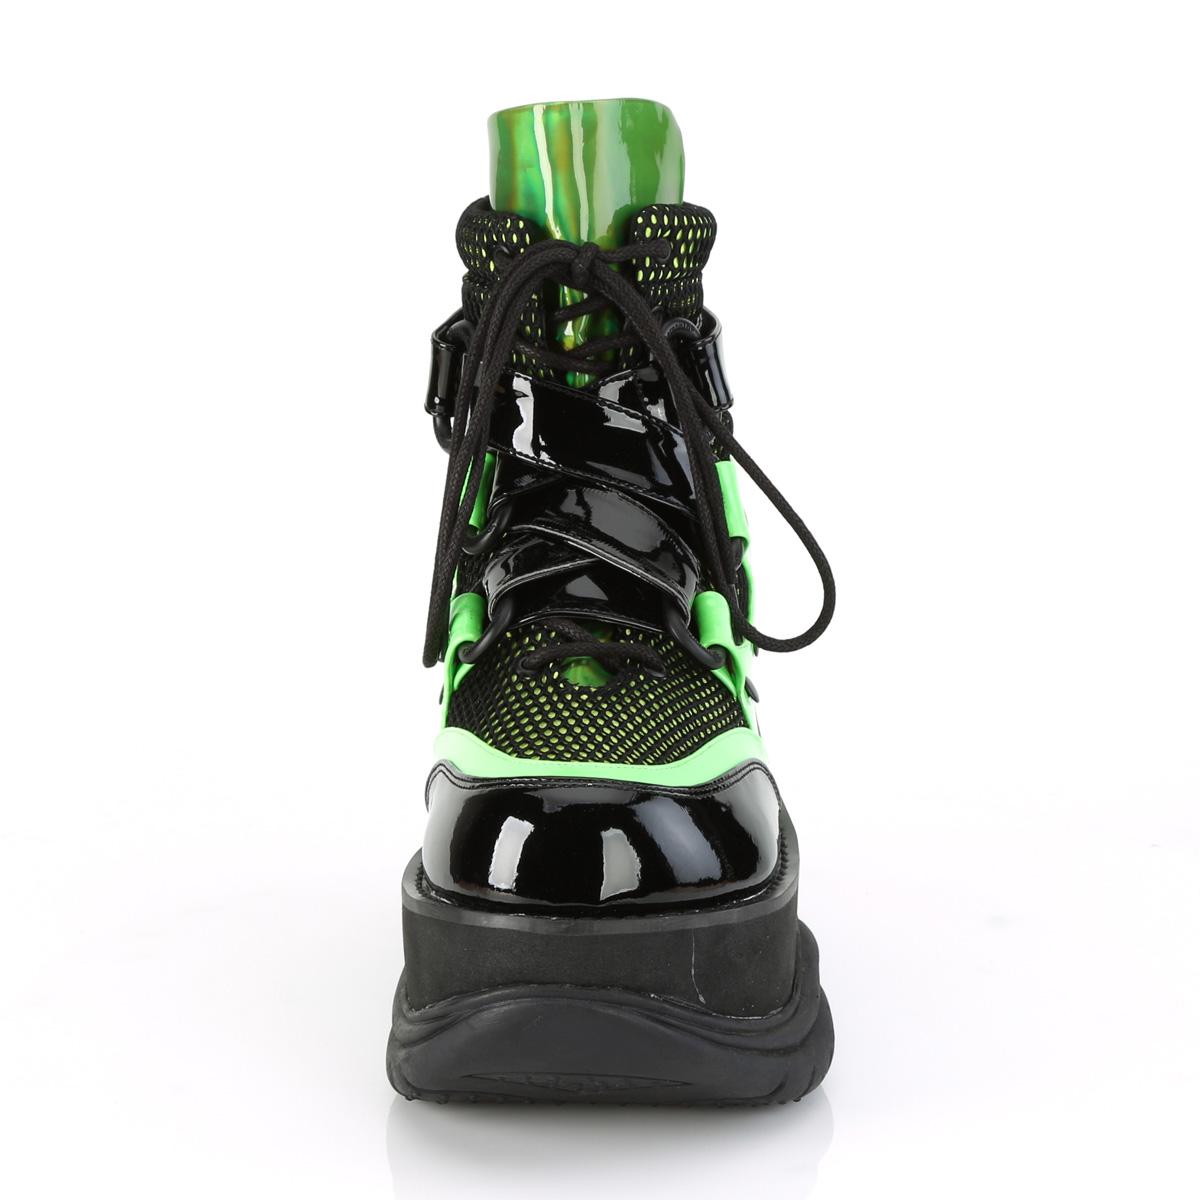 Demonia(デモニア) NEPTUNE-126 厚底スニーカー 3 inch PF Lace-Up Ankle Boot #Men's/Unisex◆取り寄せ